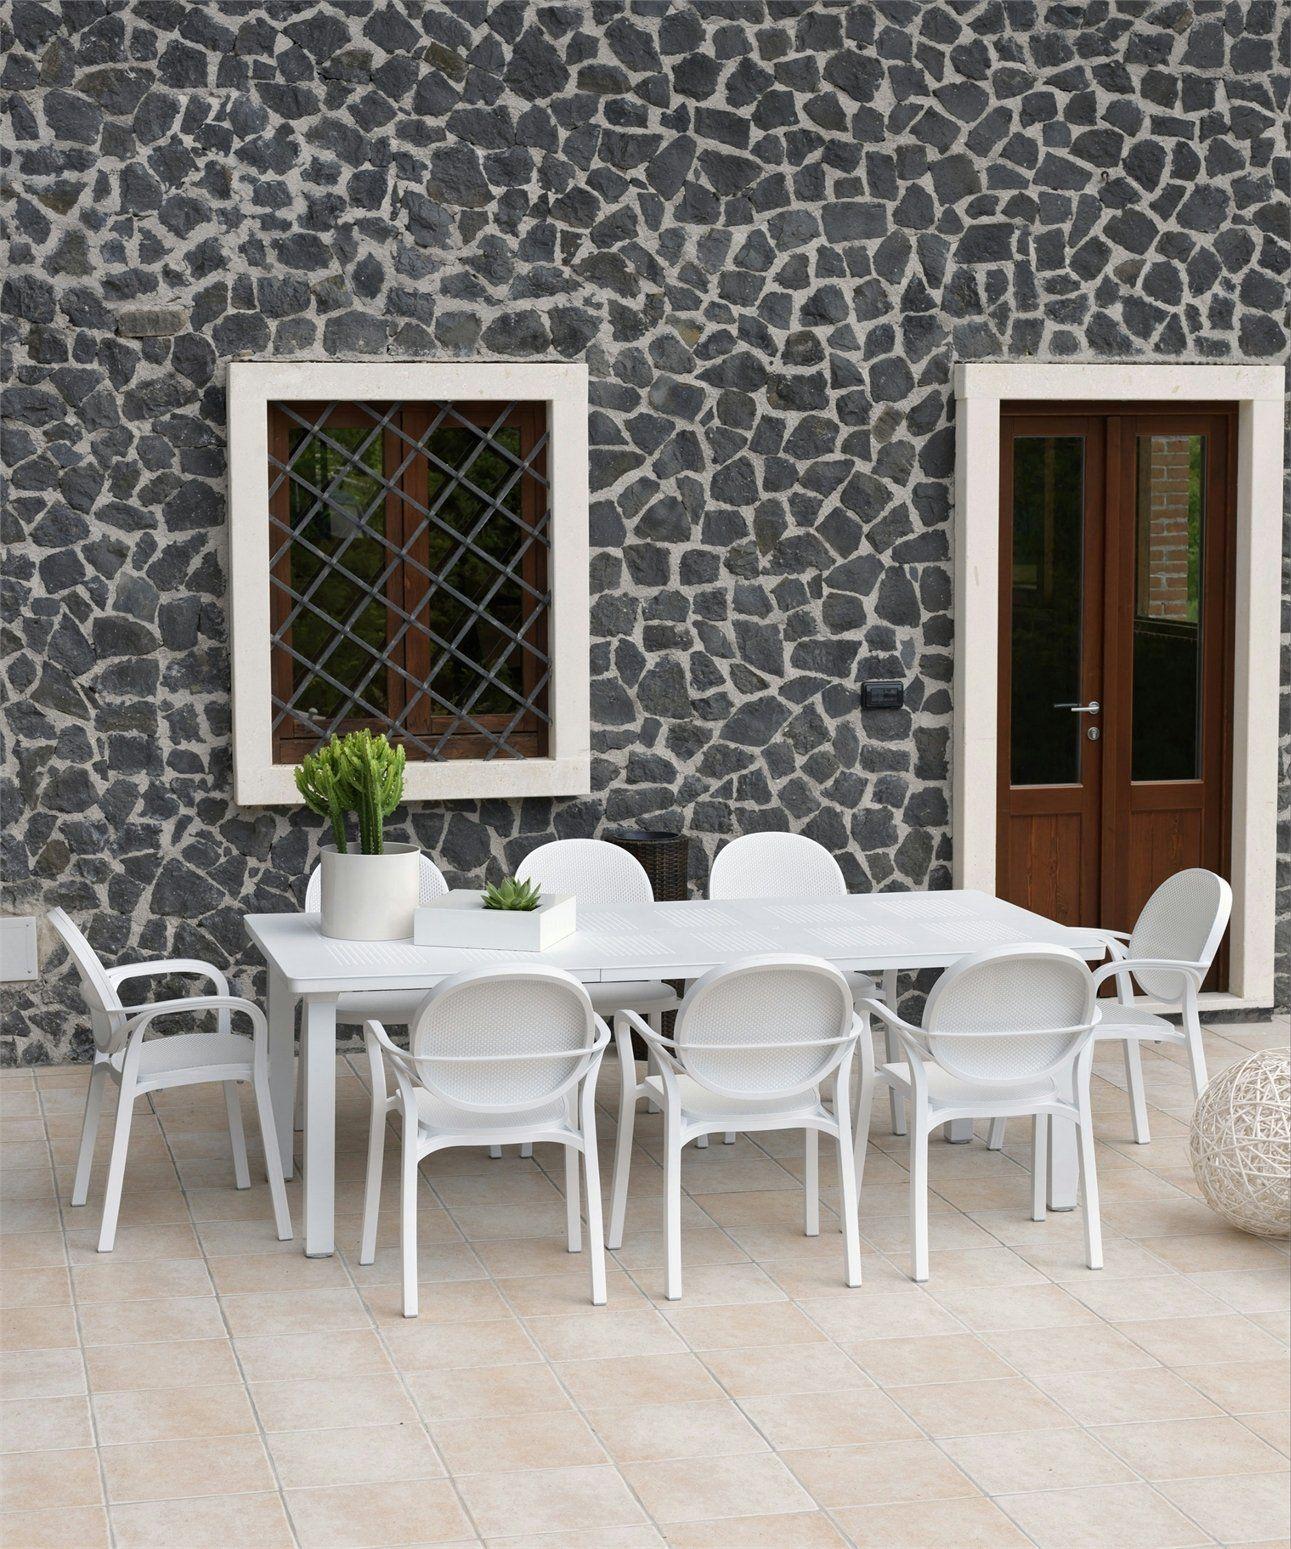 Tavoli Da Giardino Allungabili Nardi.Levante Il Tavolo Da Giardino By Nardi